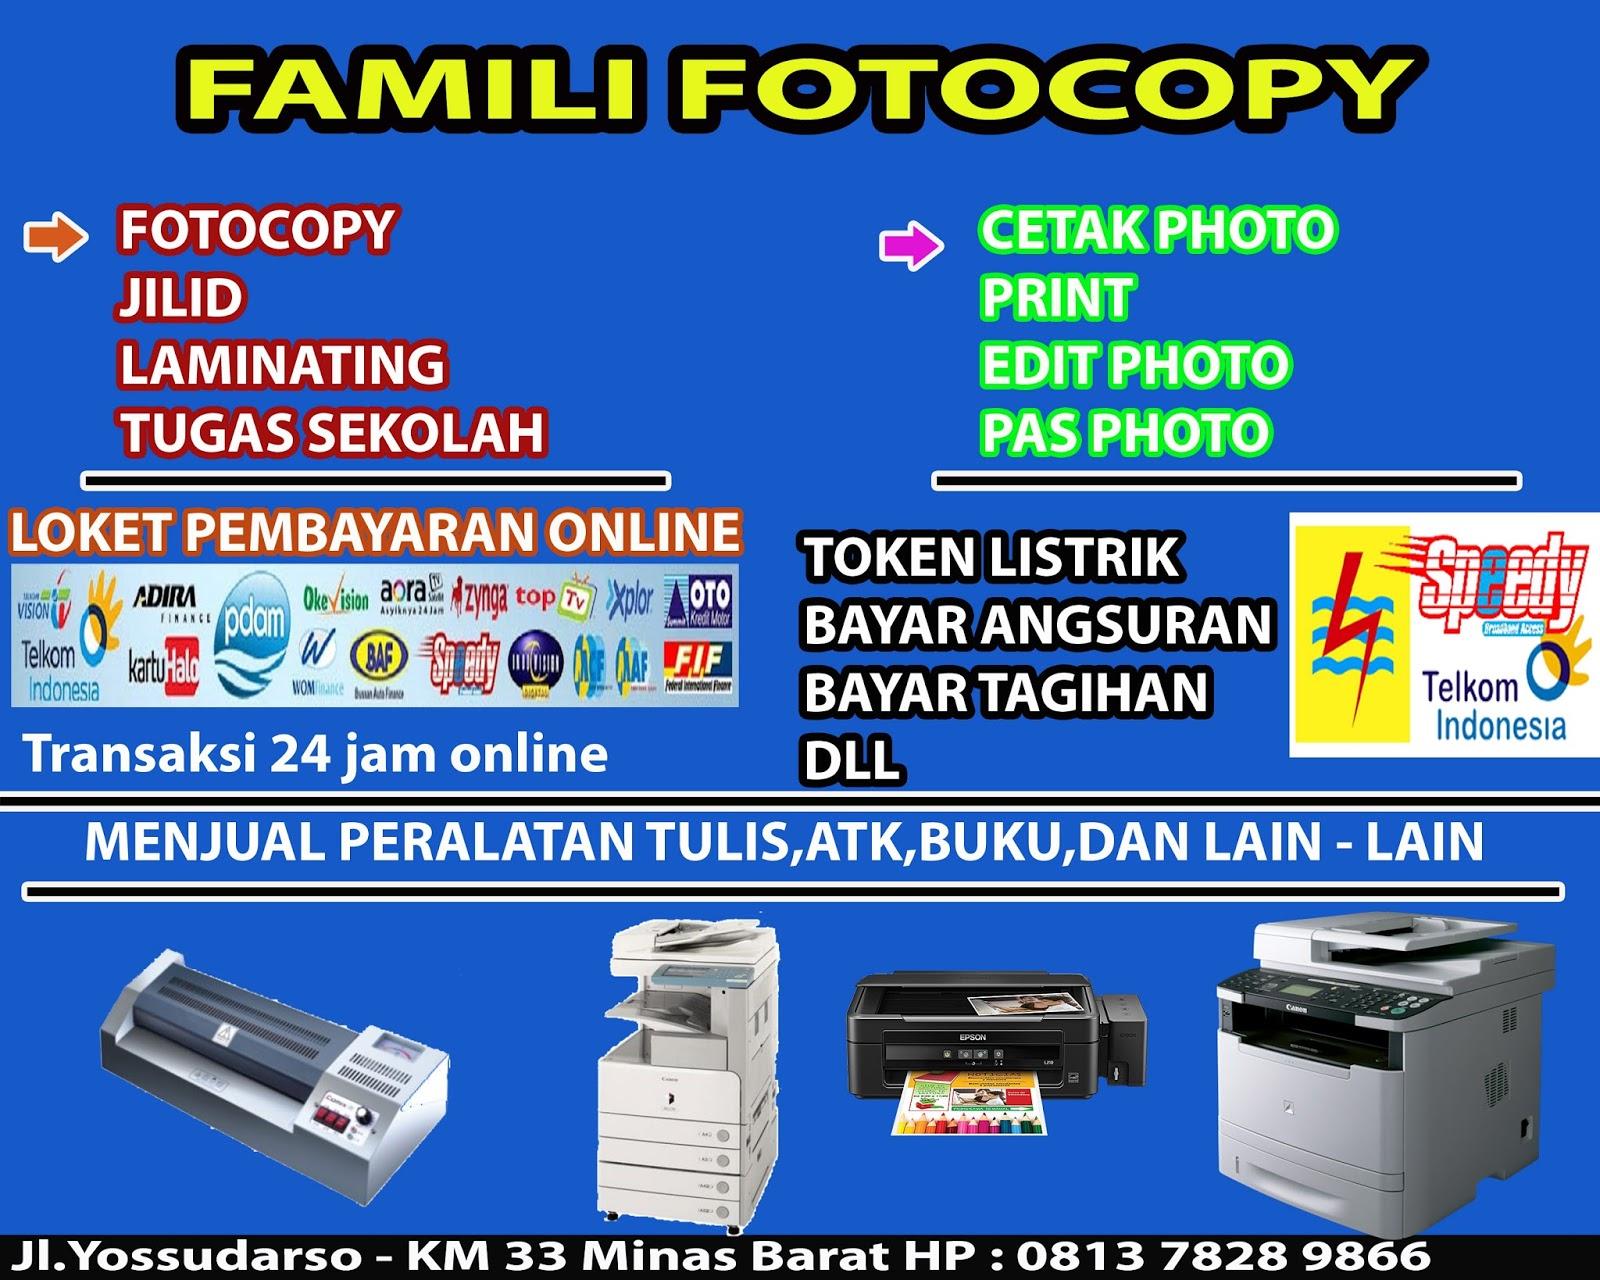 Unduh 86 Background Banner Fotocopy Gratis